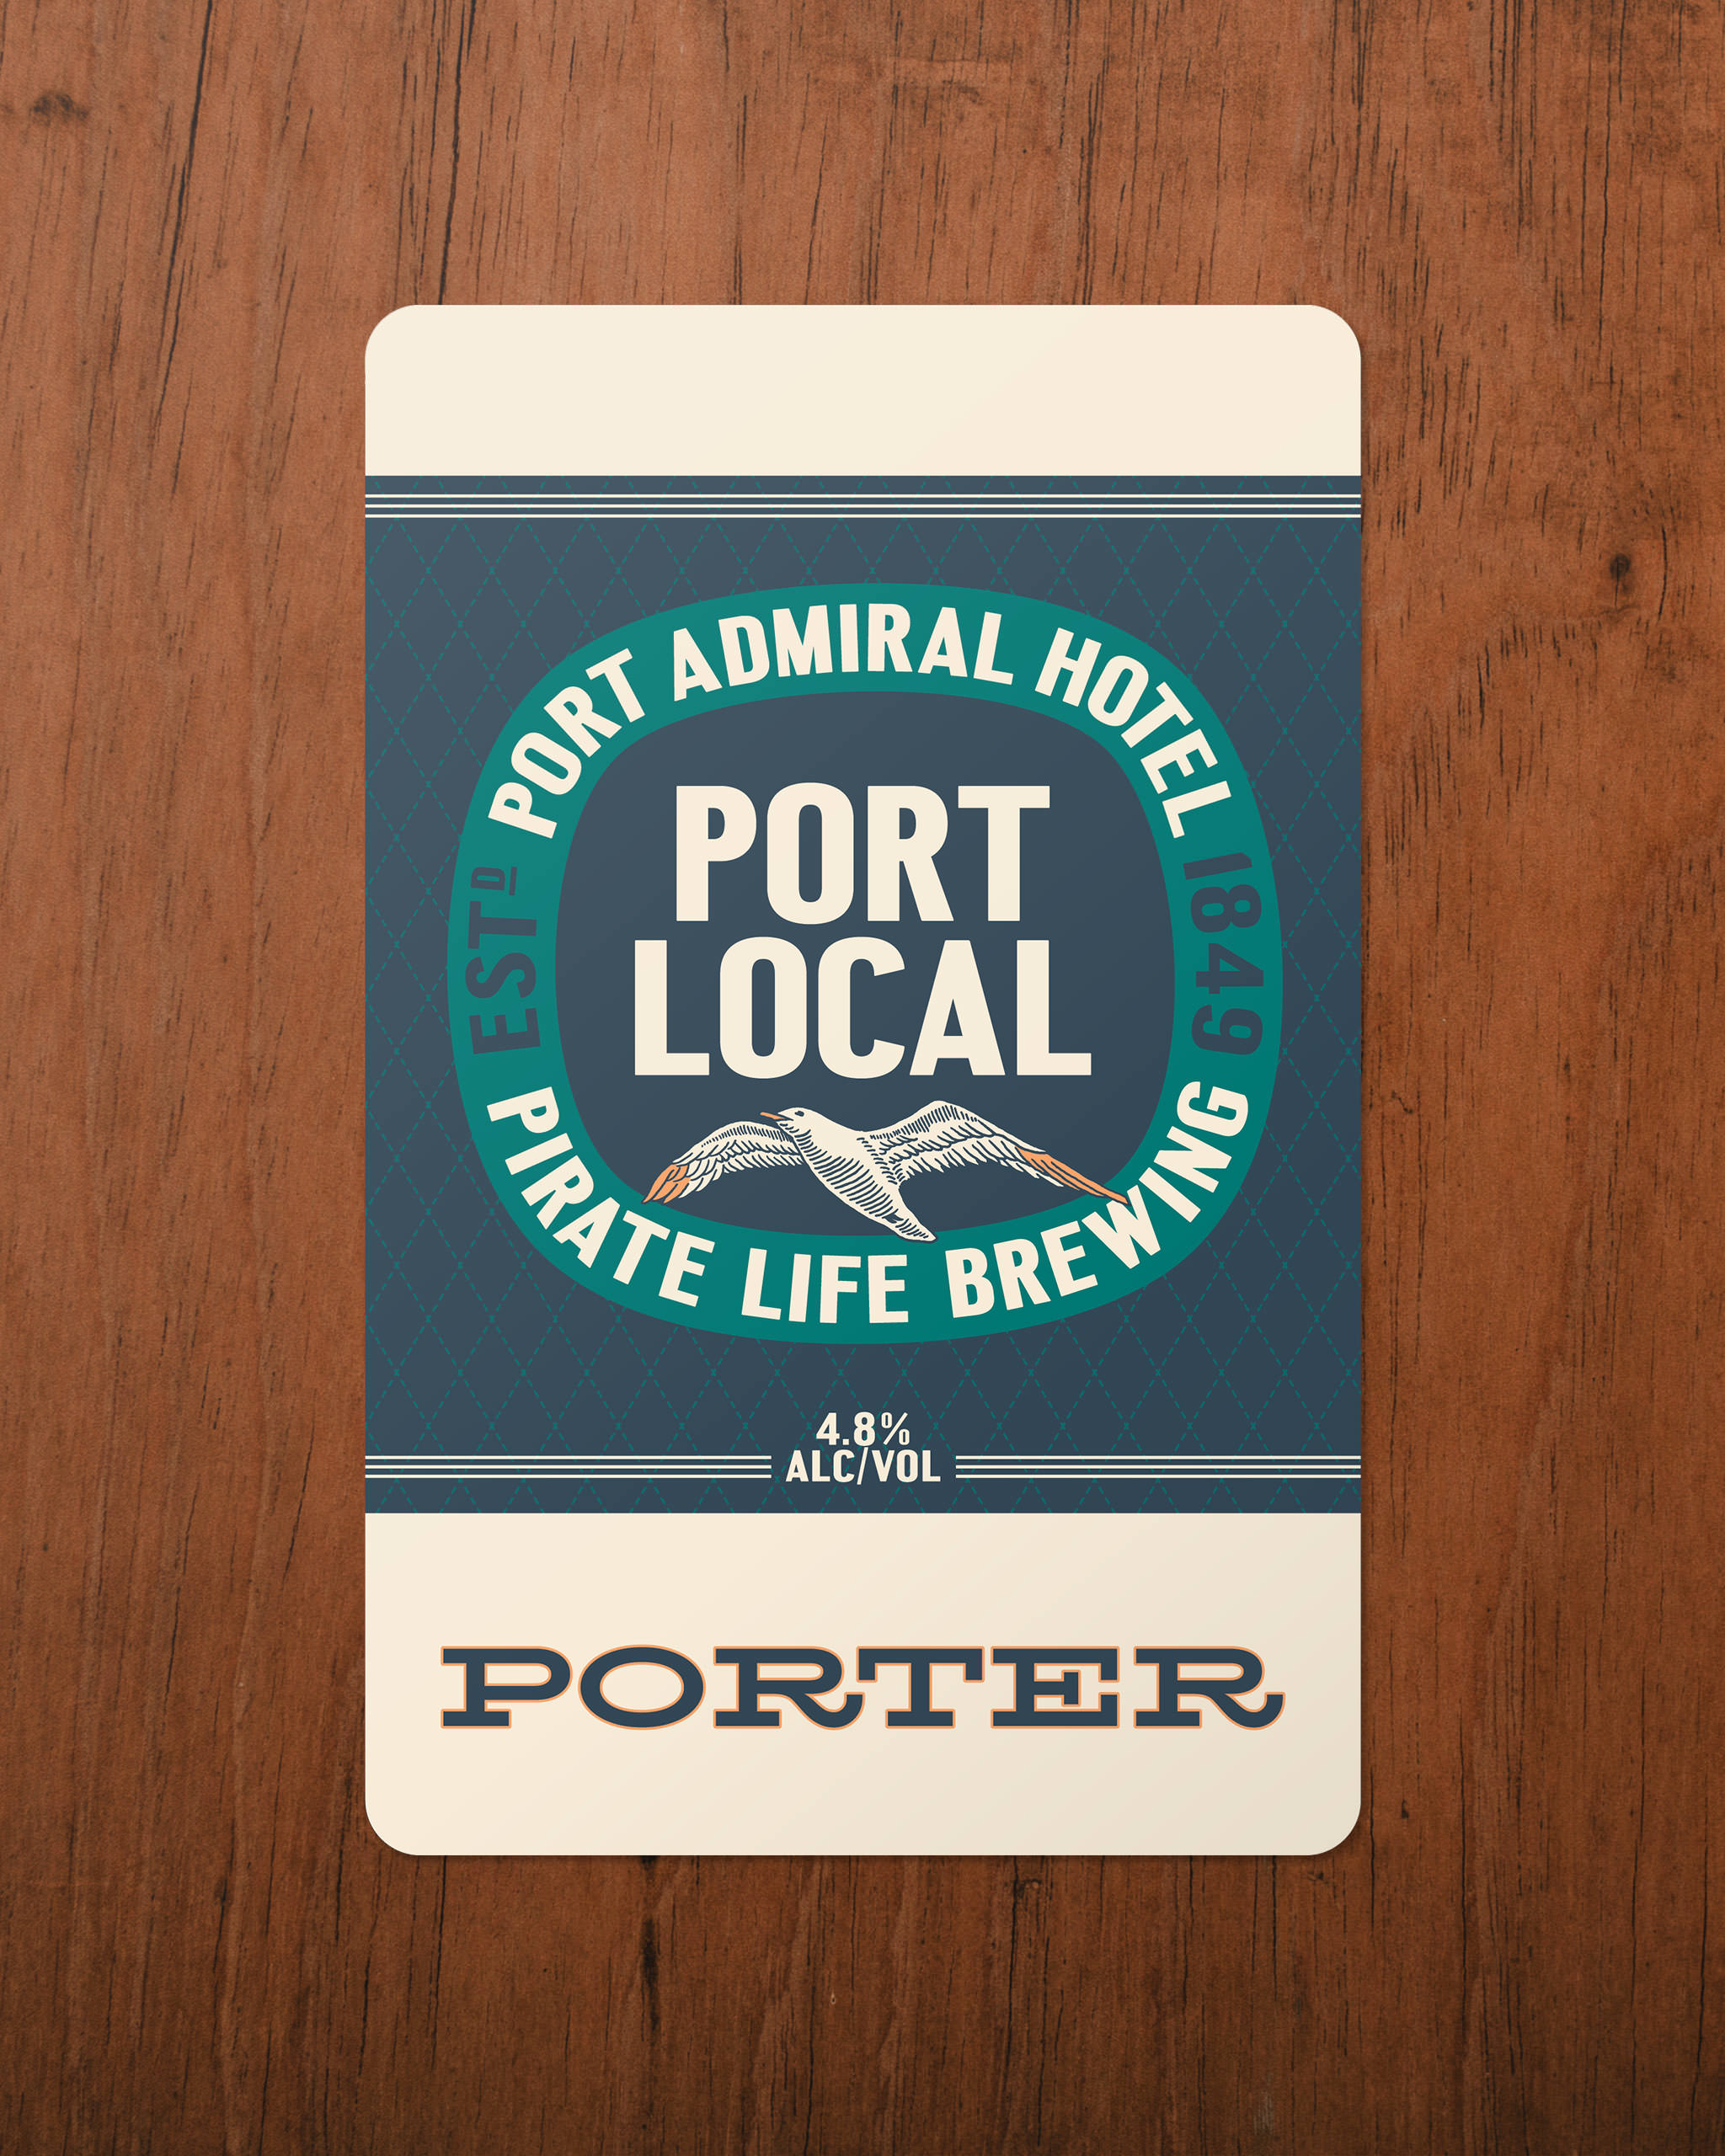 PORT LOCAL PORTER